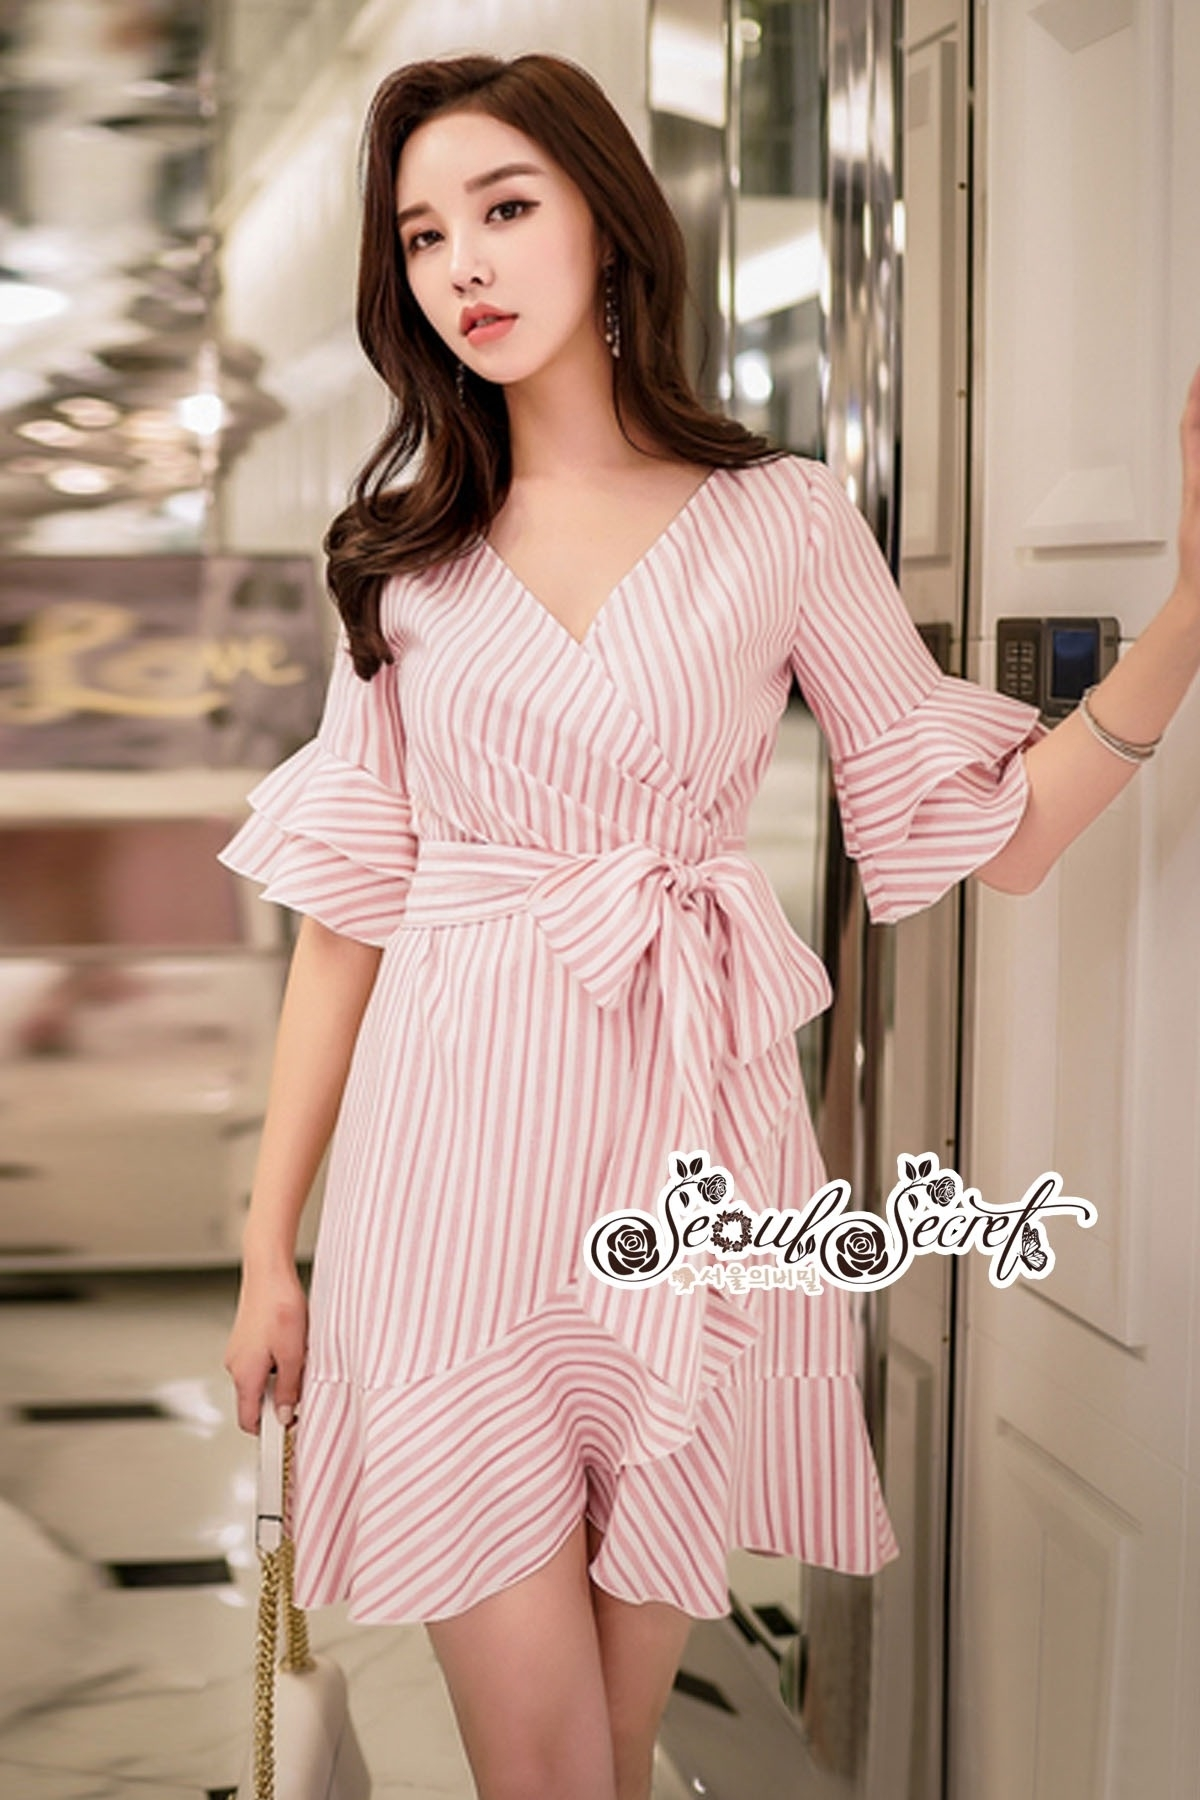 Pink Stripe Short-Sleeved Shirt Korea Style